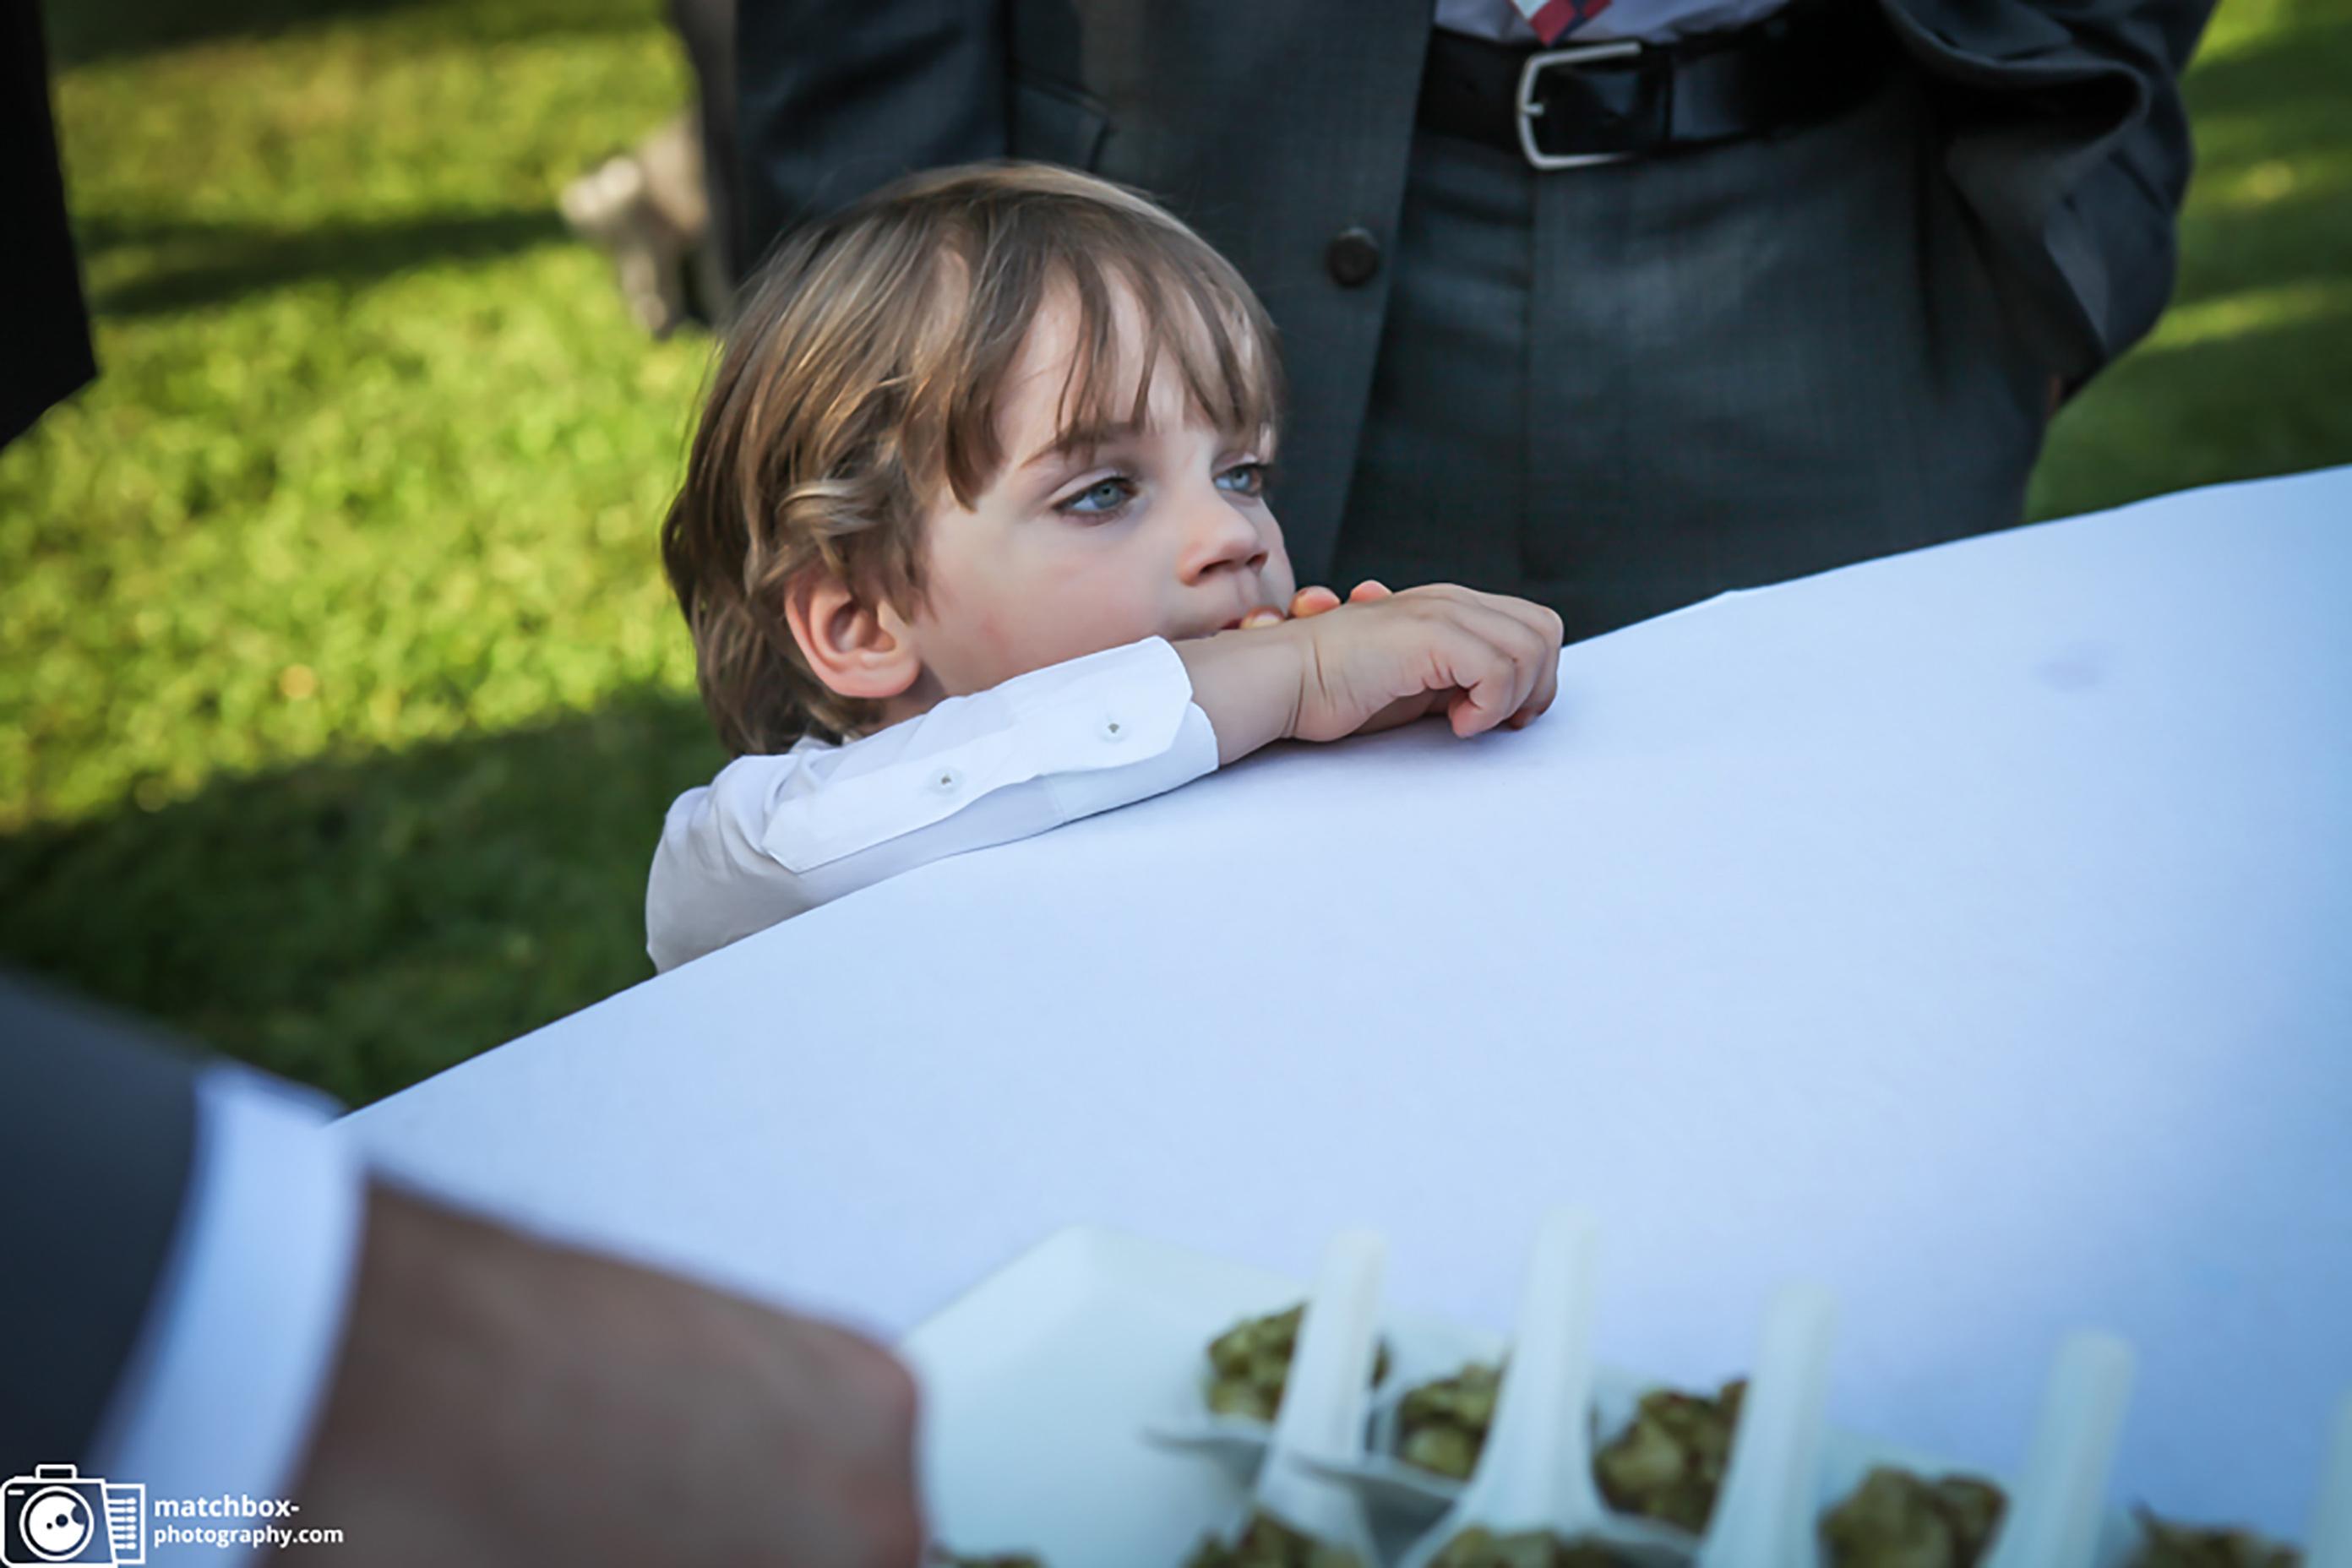 best wedding photography documentary kids anna nowakowska dublin ireland matchbox photography